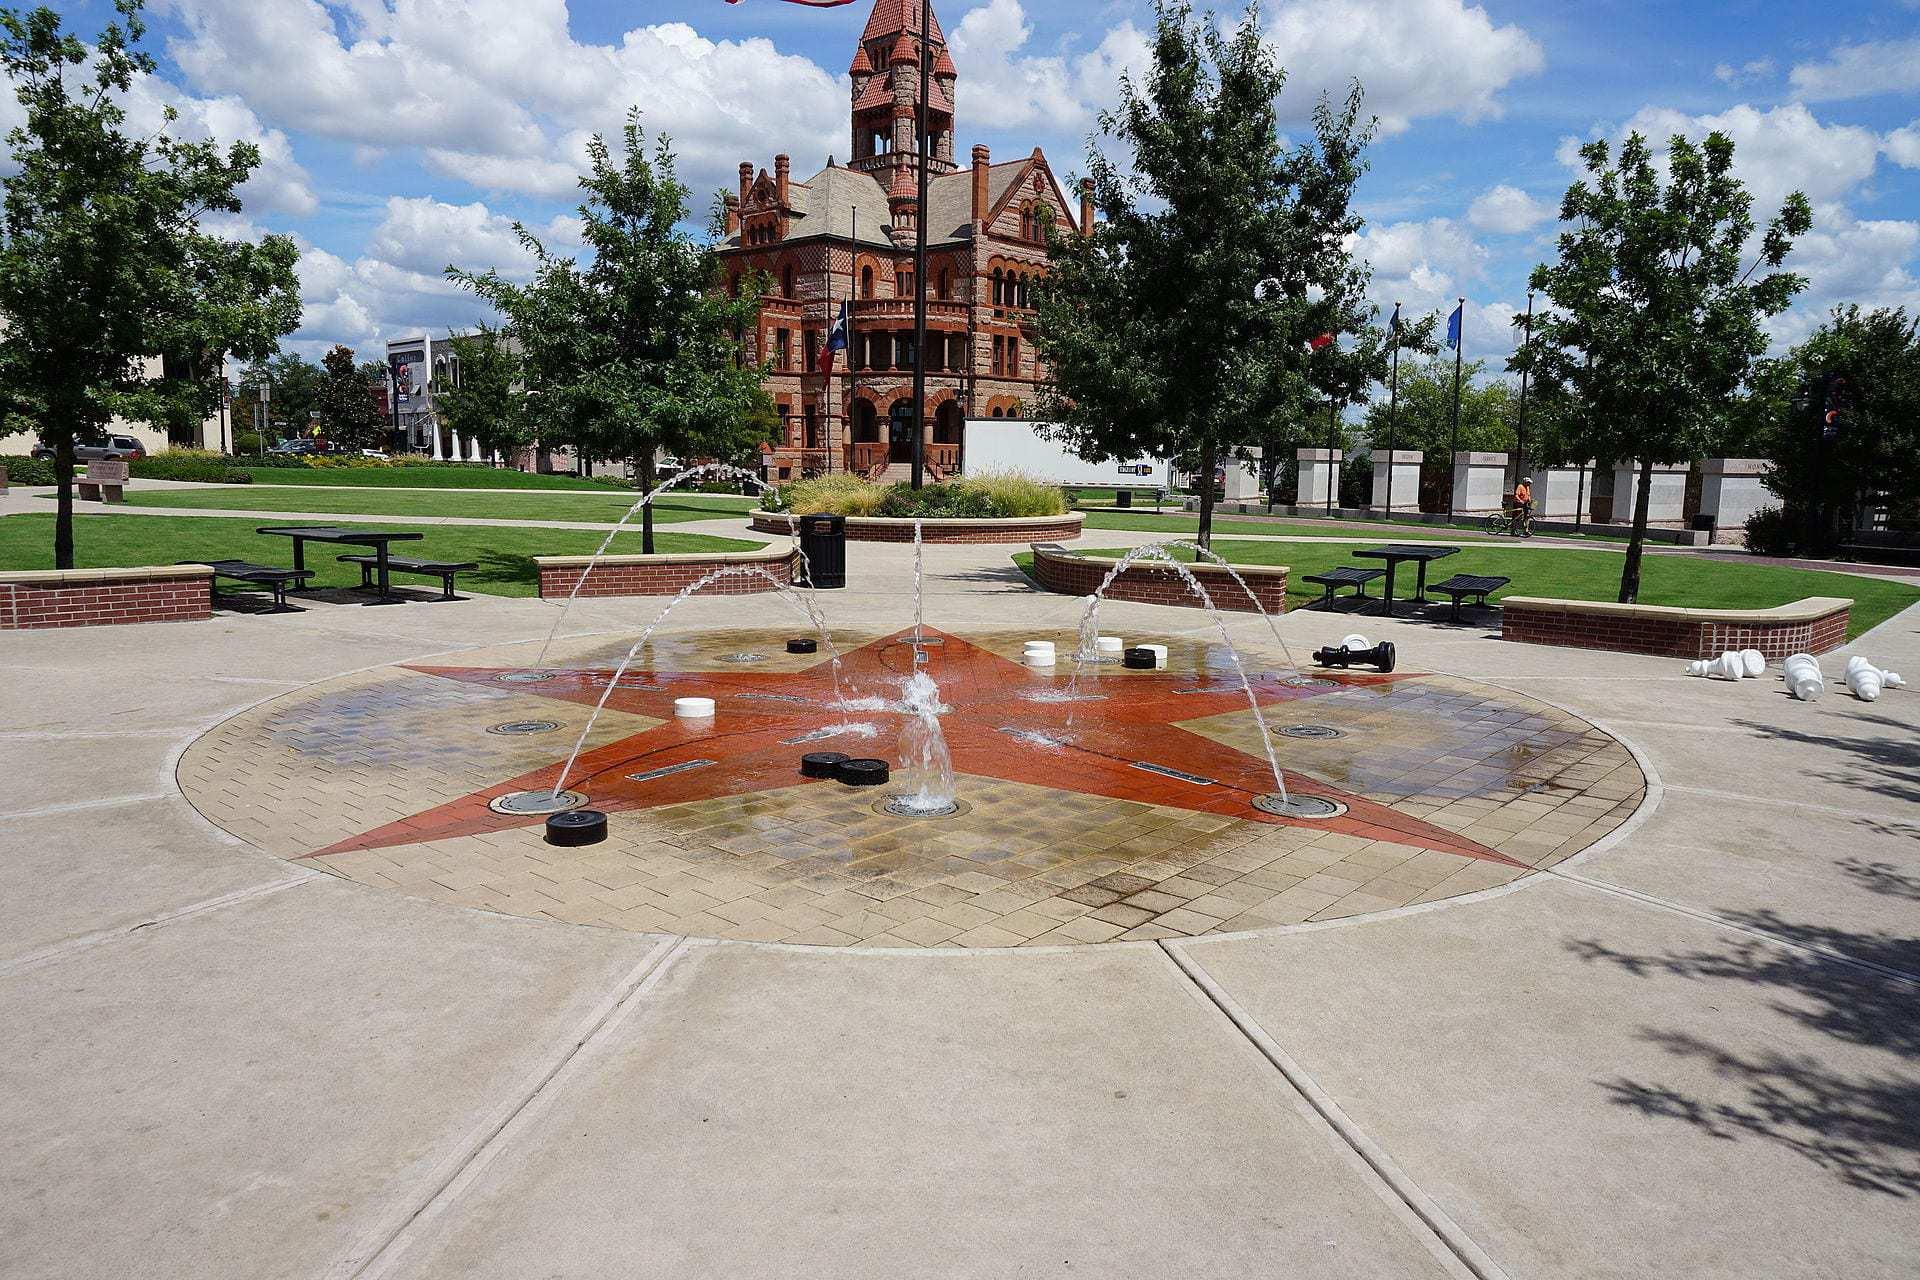 Sulphur Springs September 2015 1 Courthouse Square